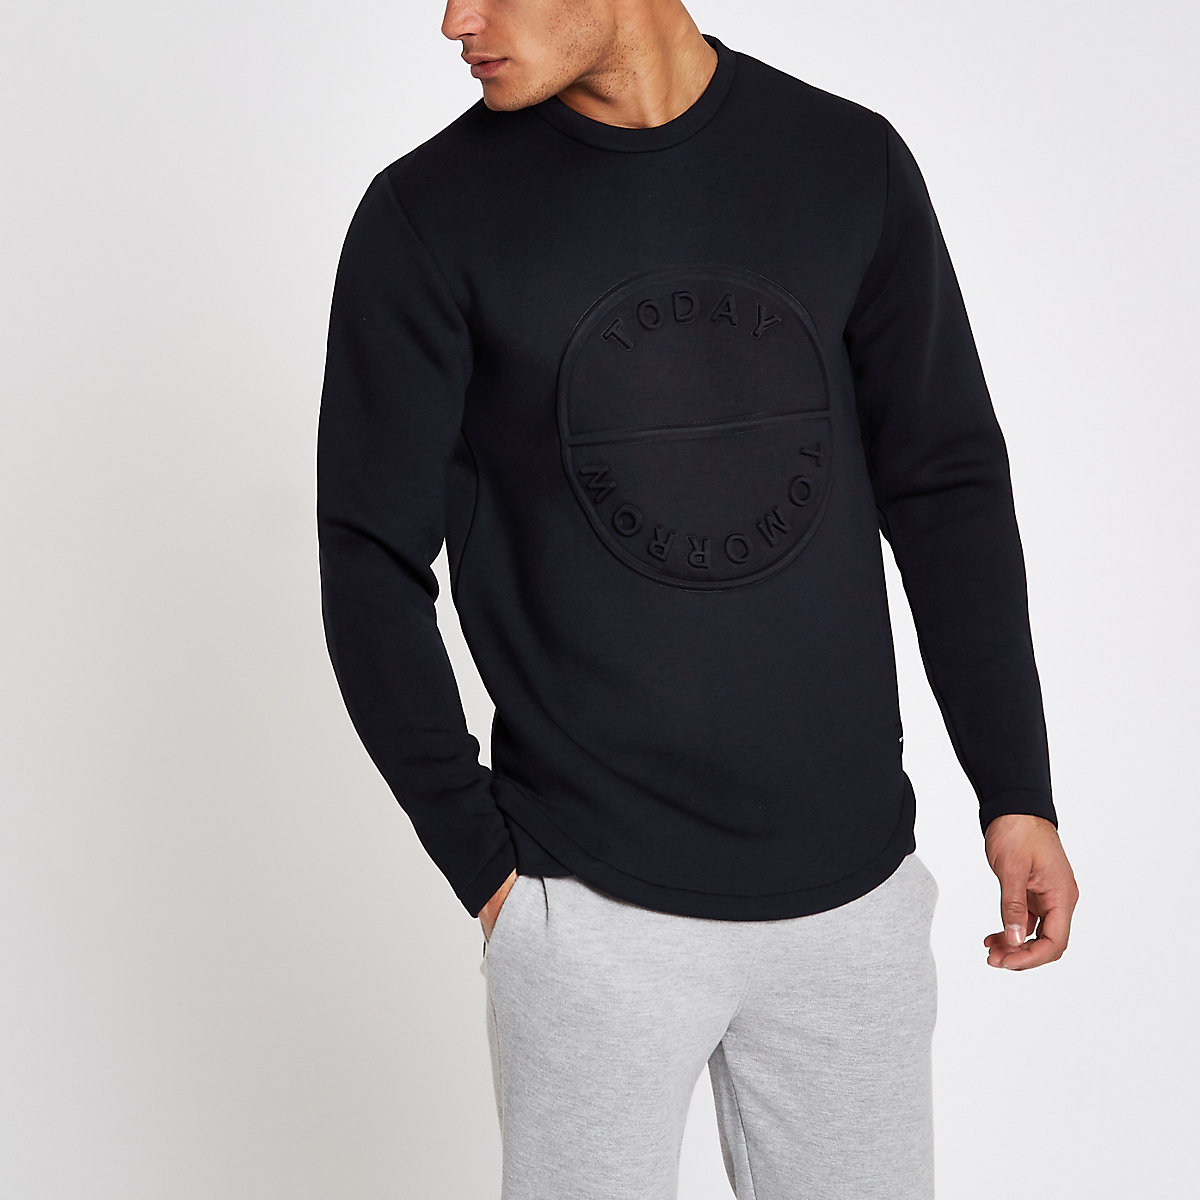 Only & Sons navy embossed sweatshirt